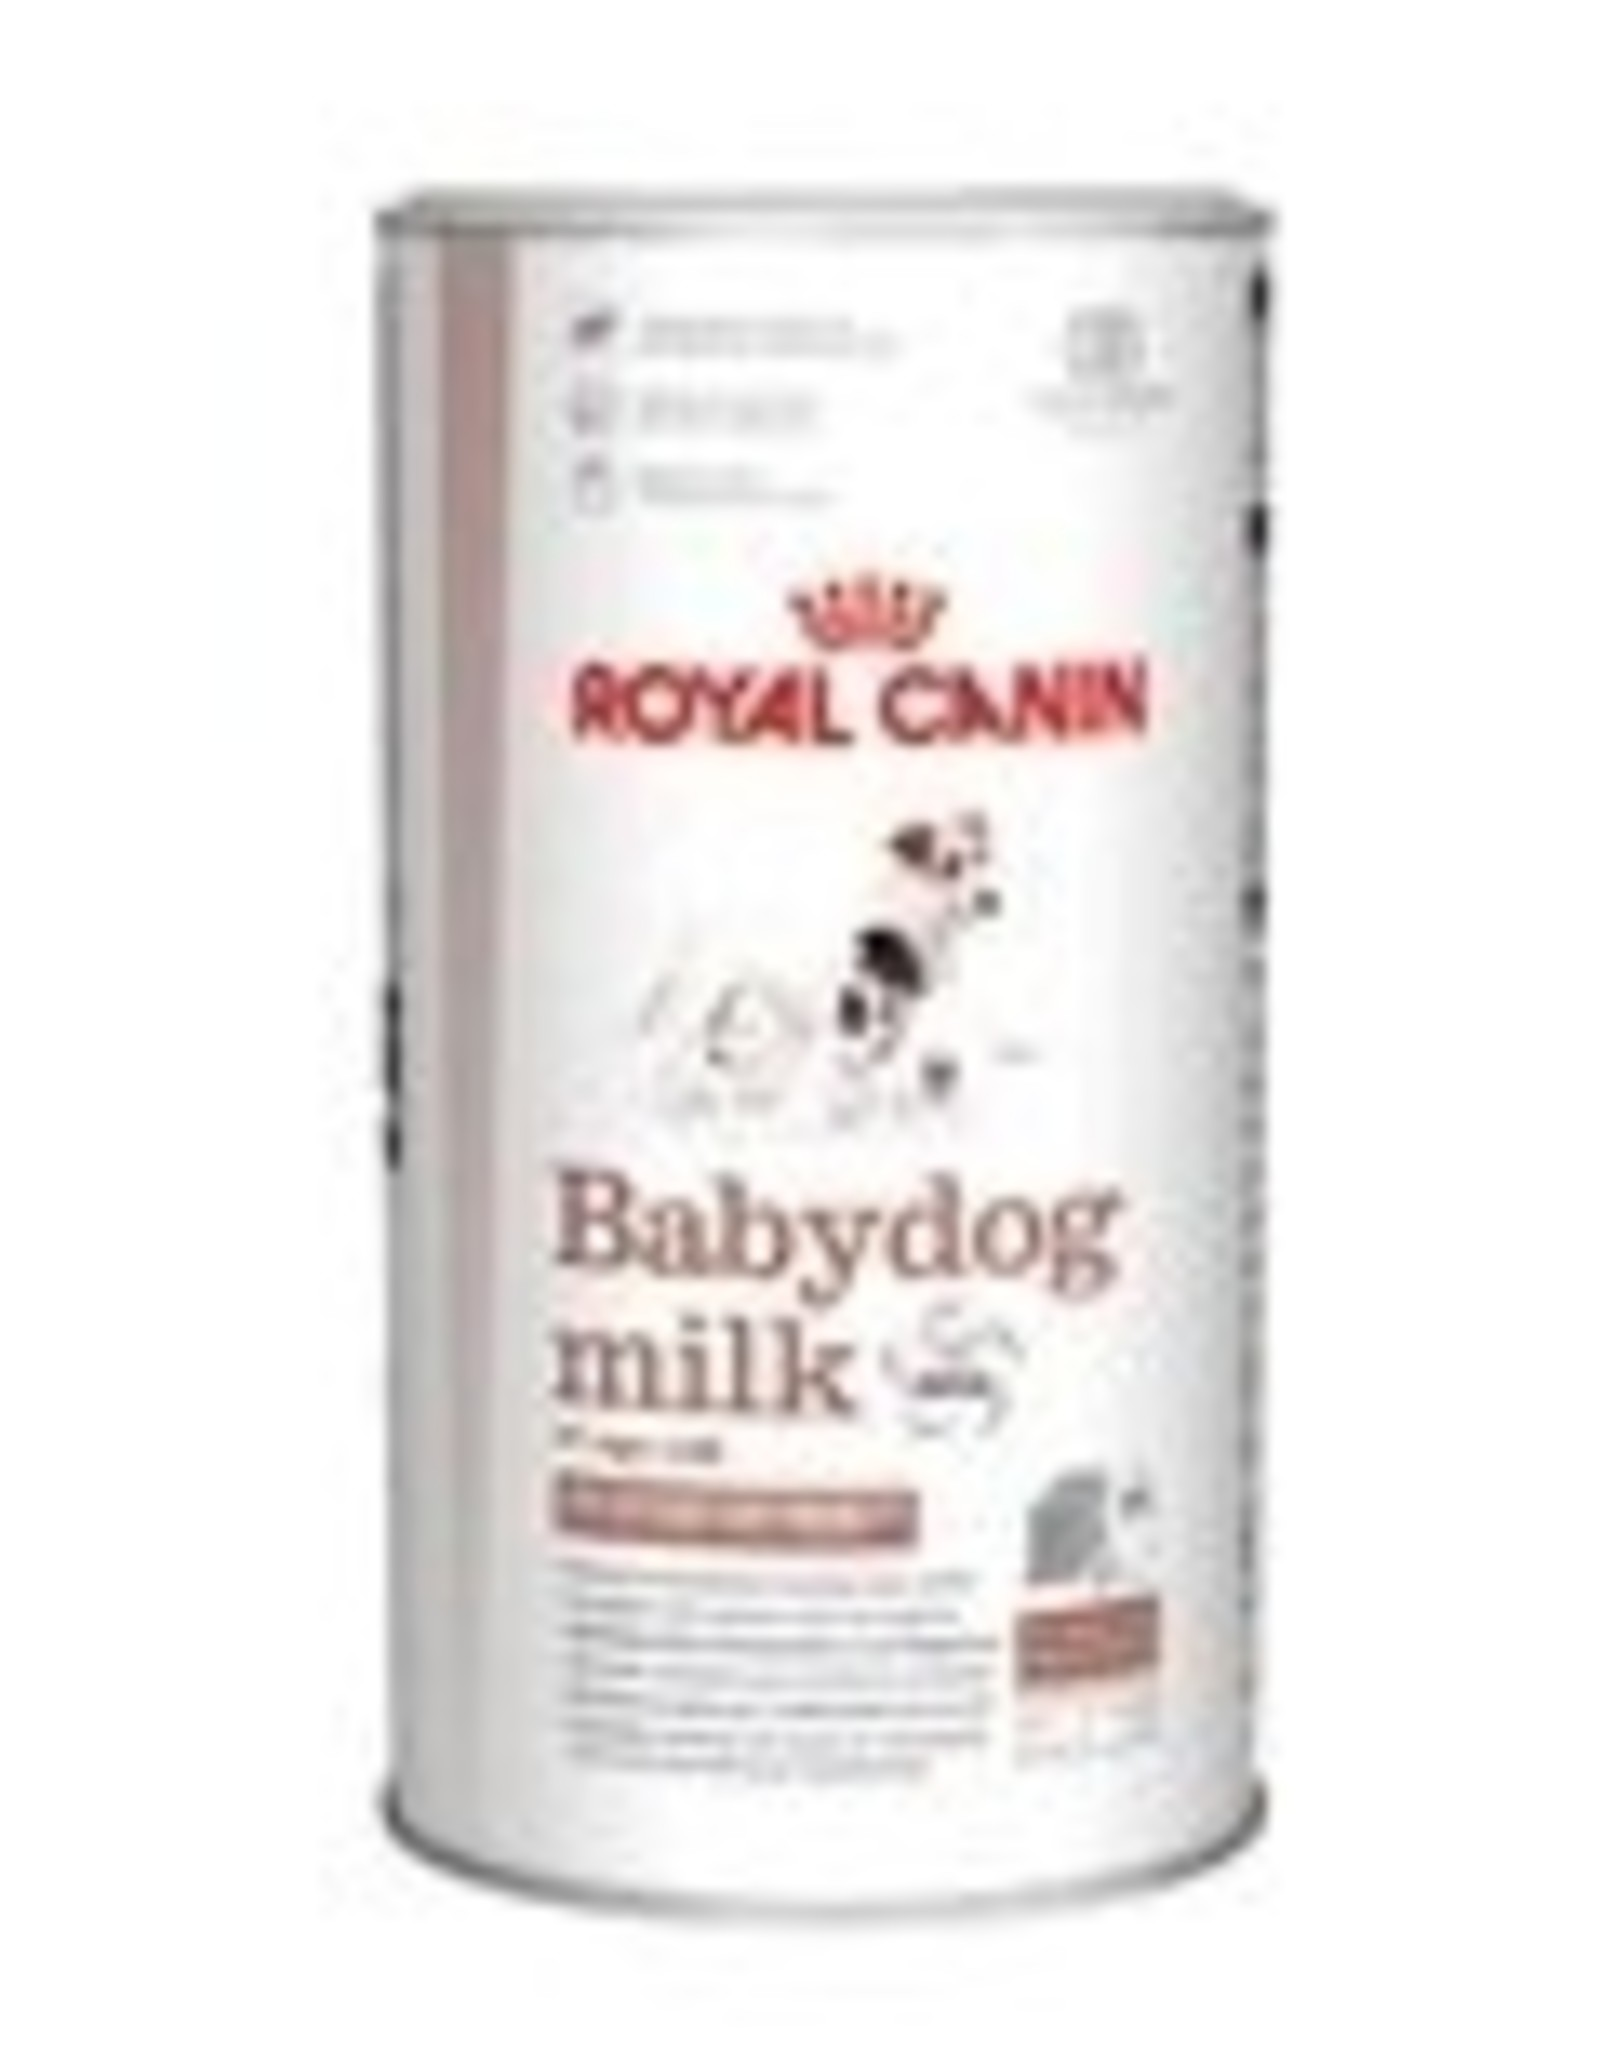 Royal Canin Royal Canin Shn Babydog Milk Hond 2kg